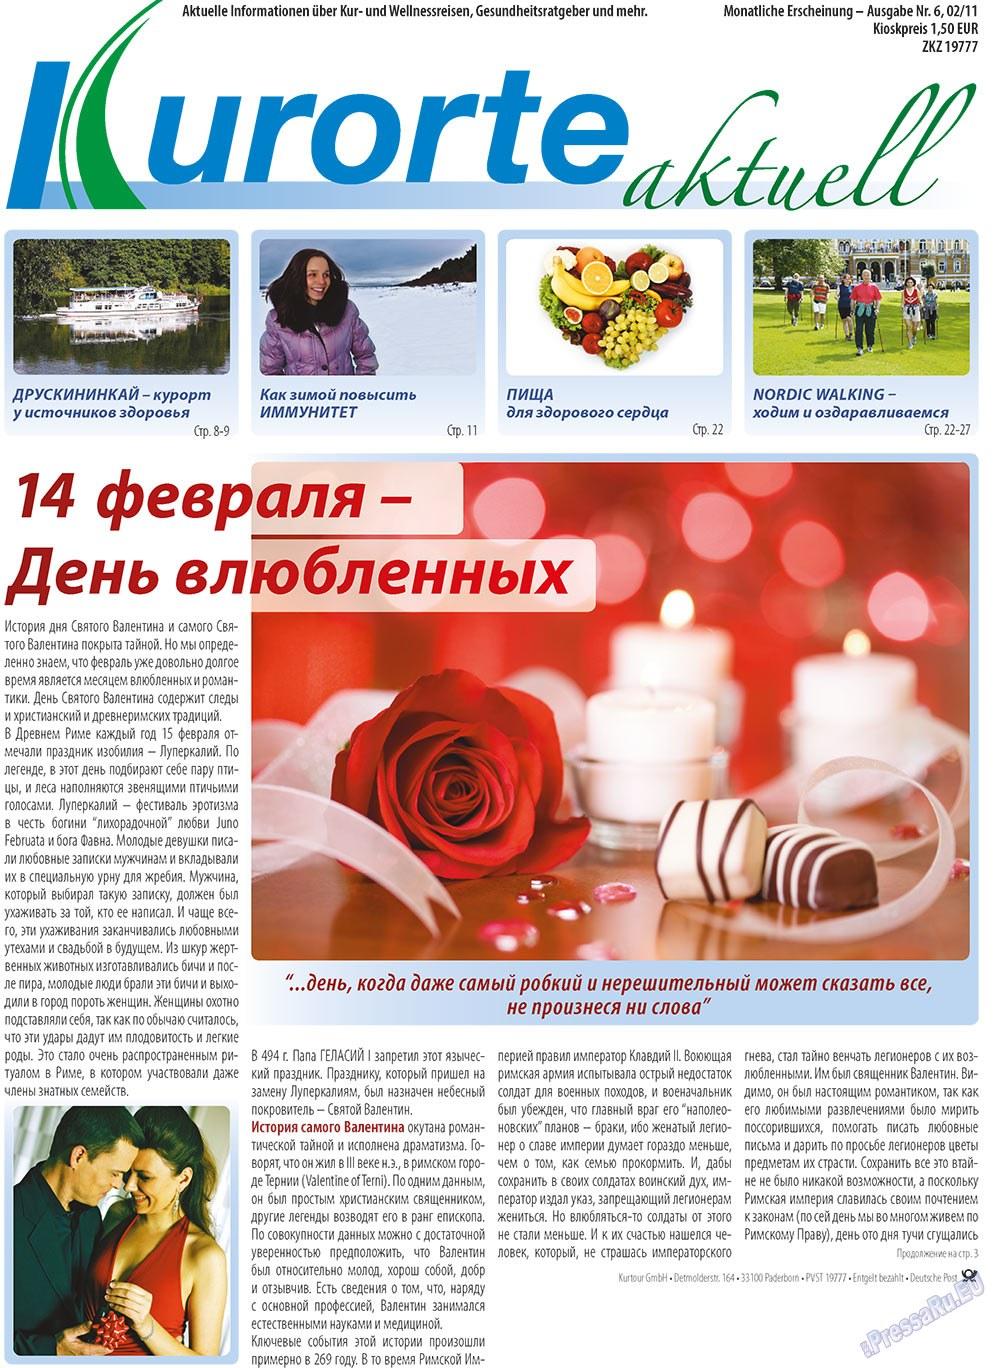 Kurorte aktuell (газета). 2011 год, номер 2, стр. 1